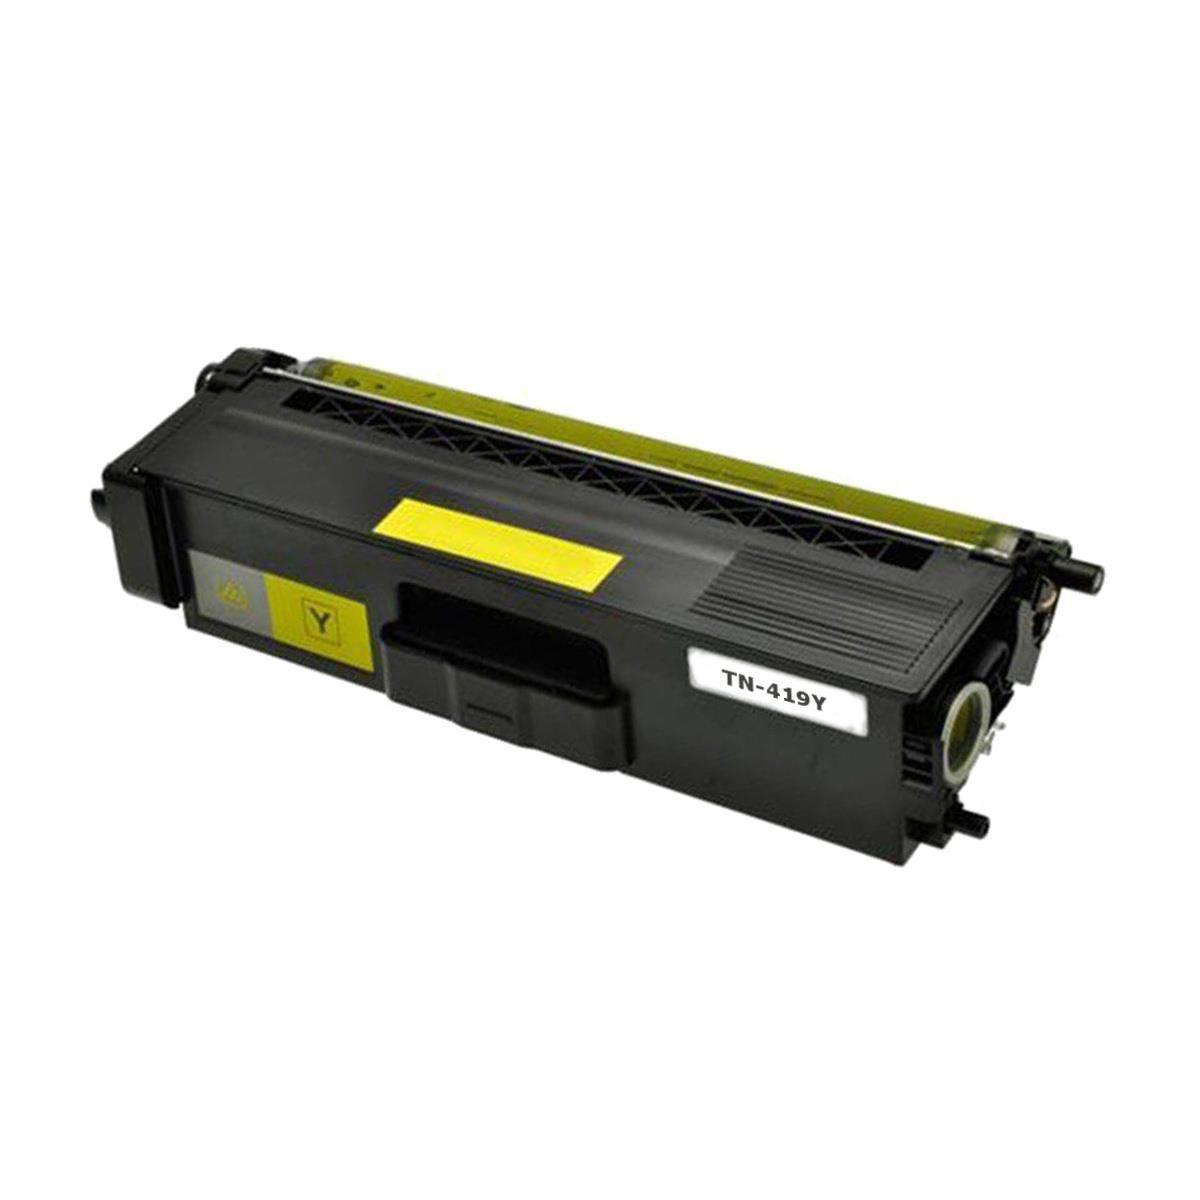 CARTUCHO BROTHER (TN419/416) HL-L8360CDW/MFC-L8610/L8900/L9570 AMARELO 6,5k (COMPATIVEL)